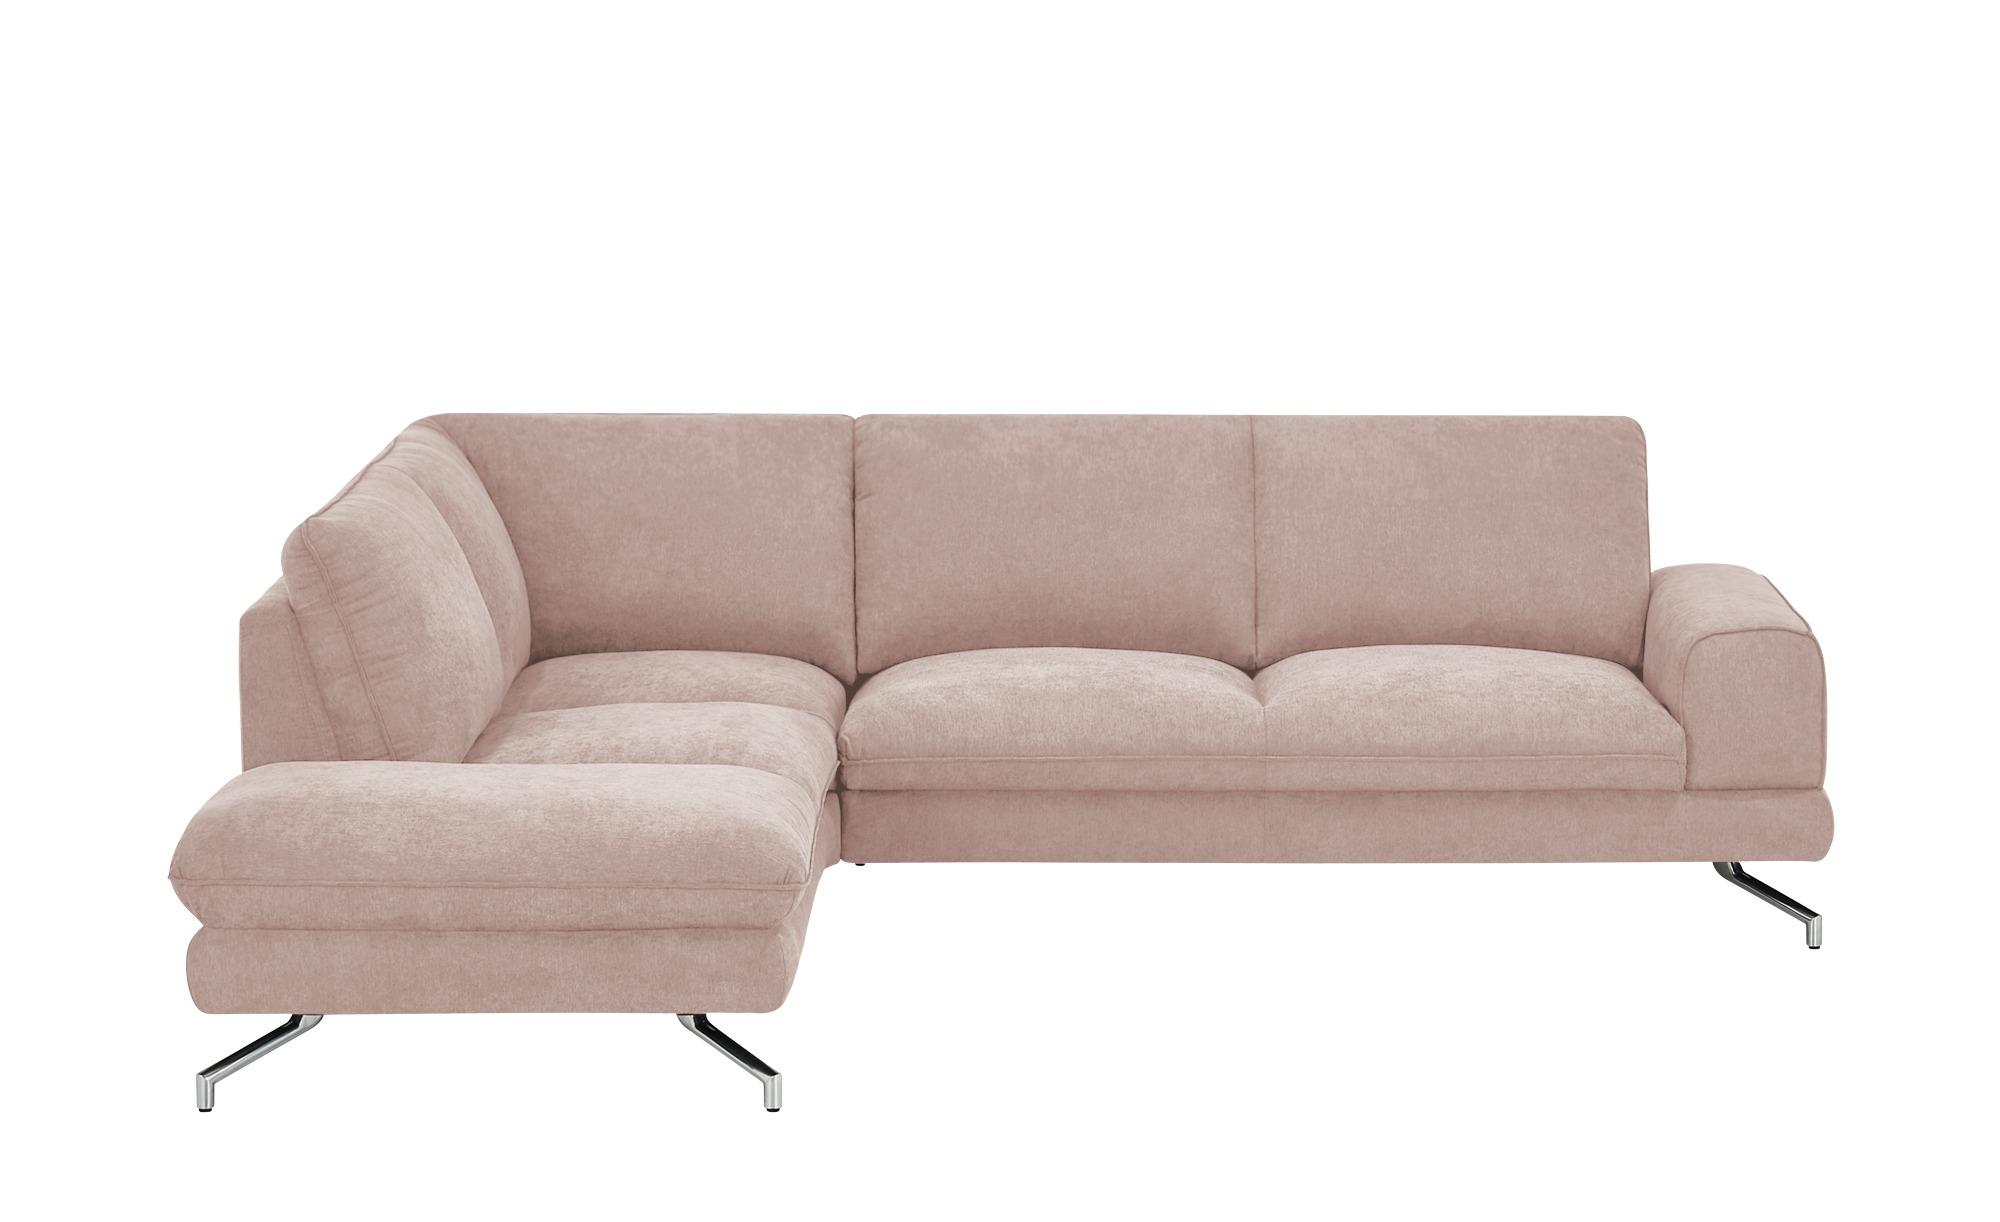 smart Ecksofa  Bonika ¦ rosa/pink ¦ Maße (cm): H: 83 Polstermöbel > Sofas > Ecksofas - Höffner